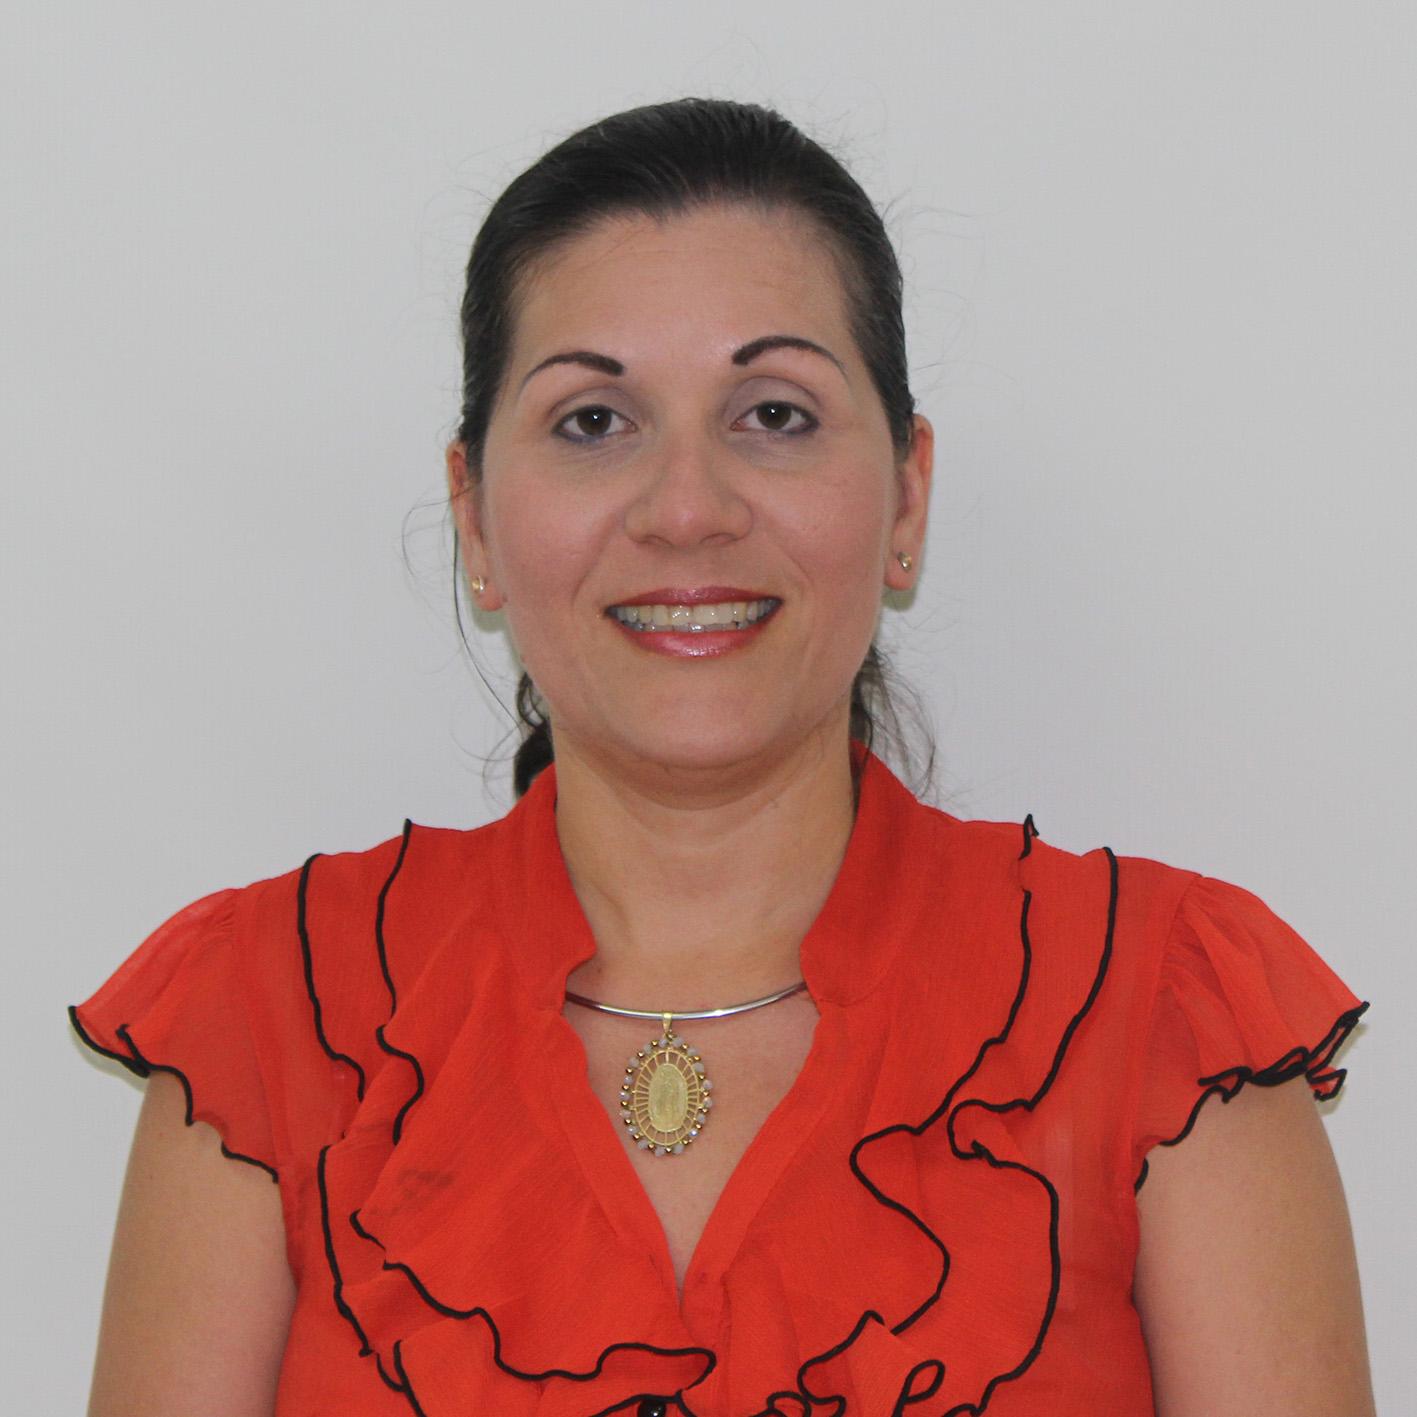 Luiyiana Del carmen Perez